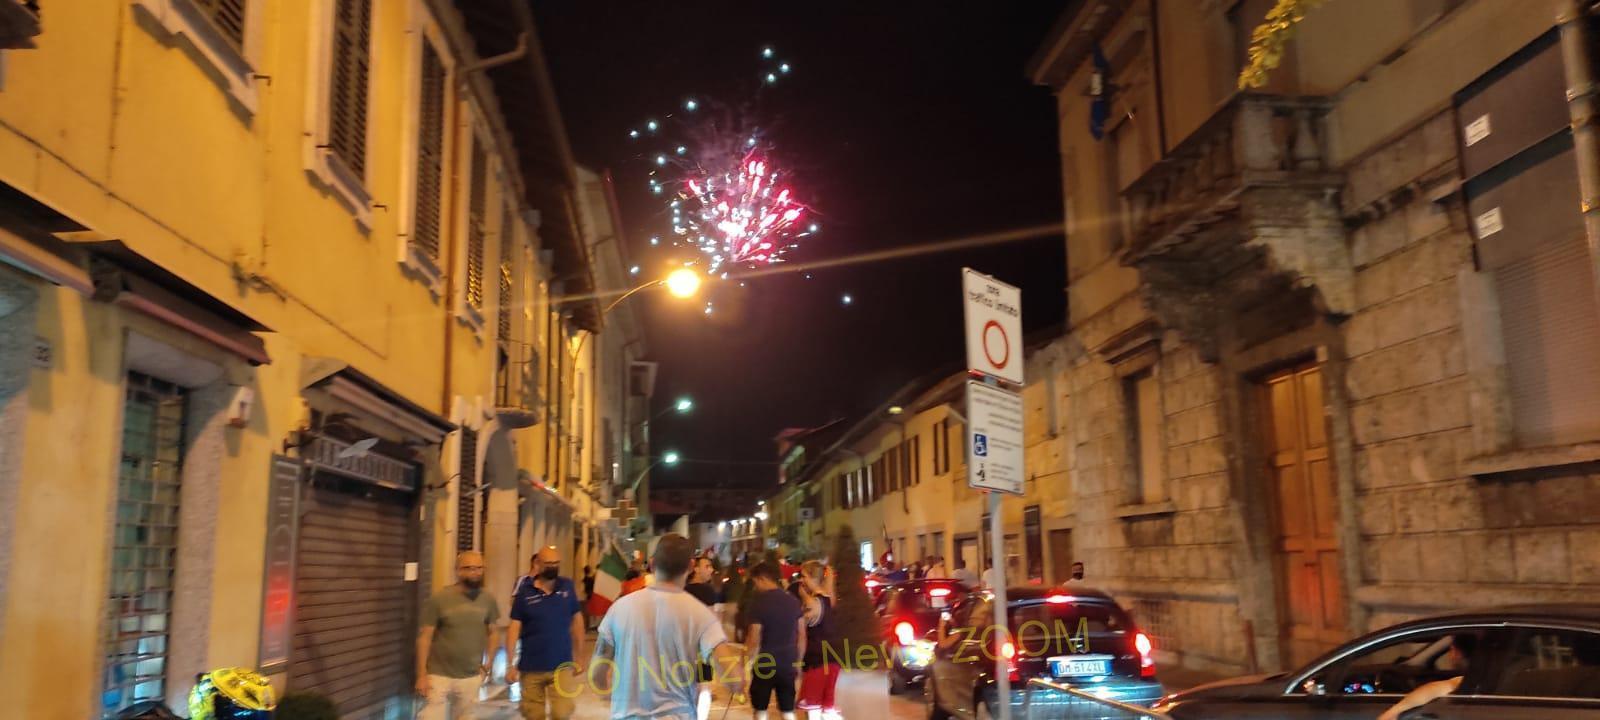 Milano provincia - Campioni d'Europa! Magenta 12/07/2021